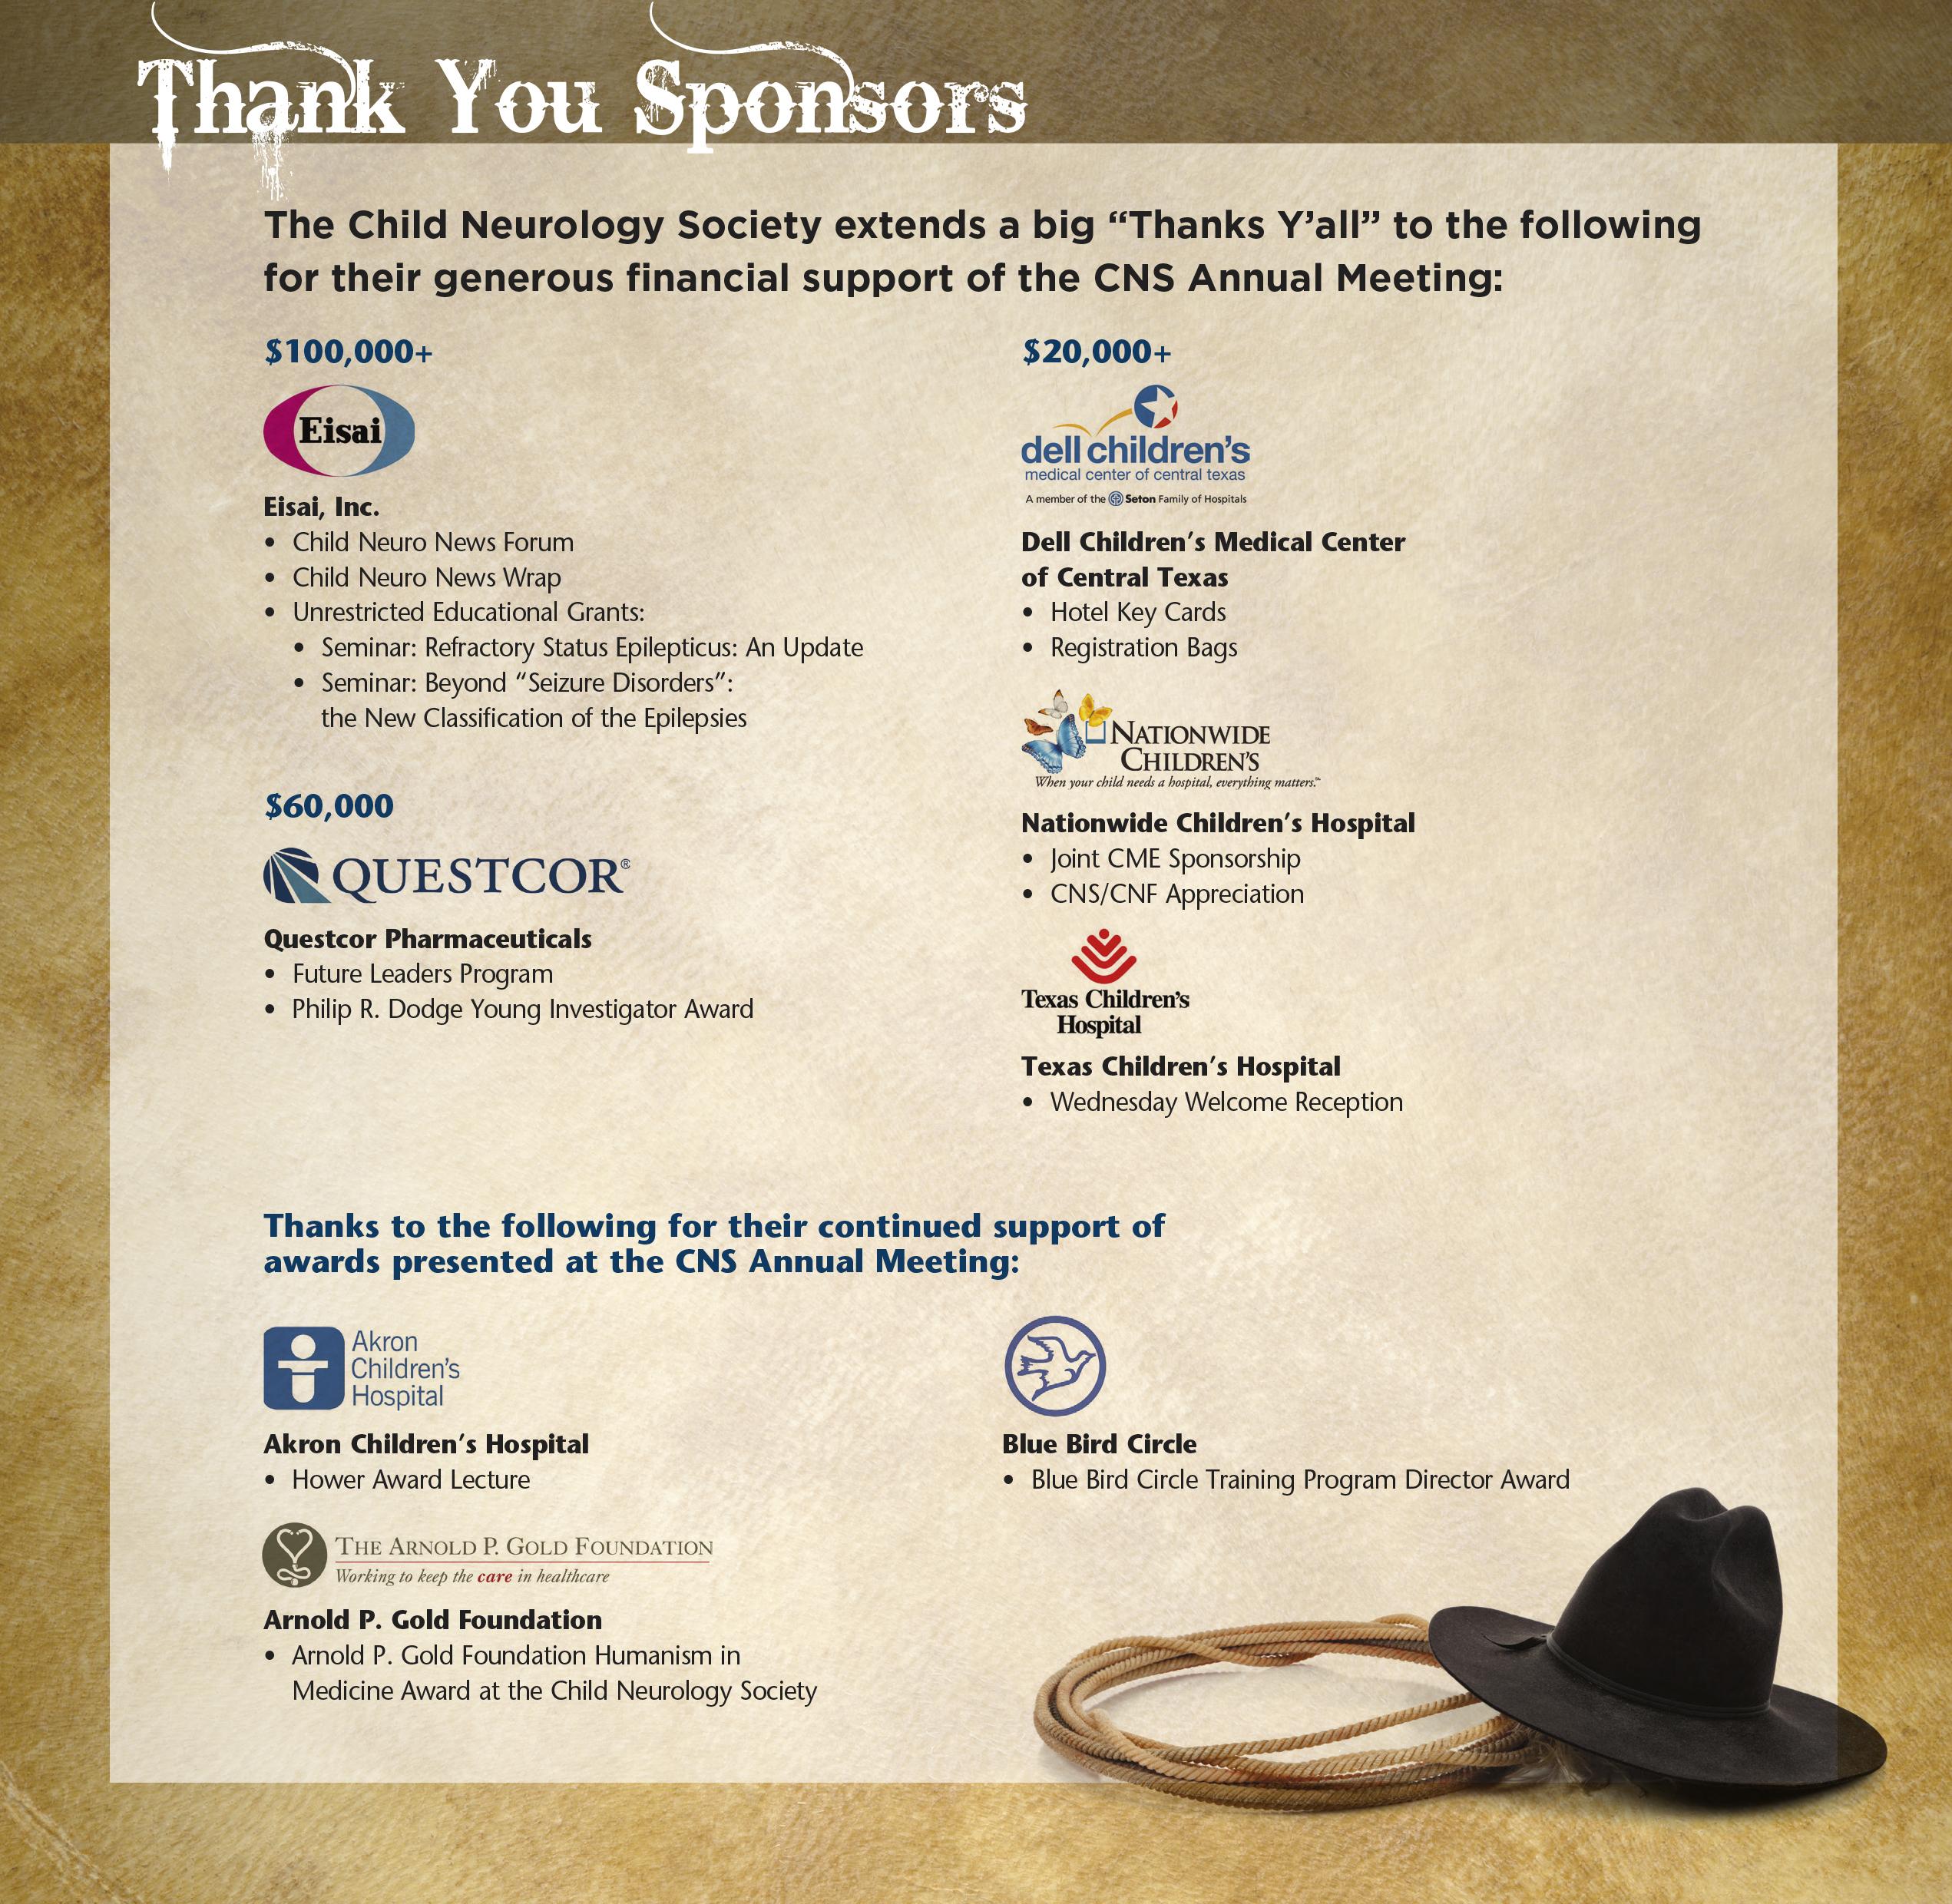 42th CNS Annual Meeting Sponsors